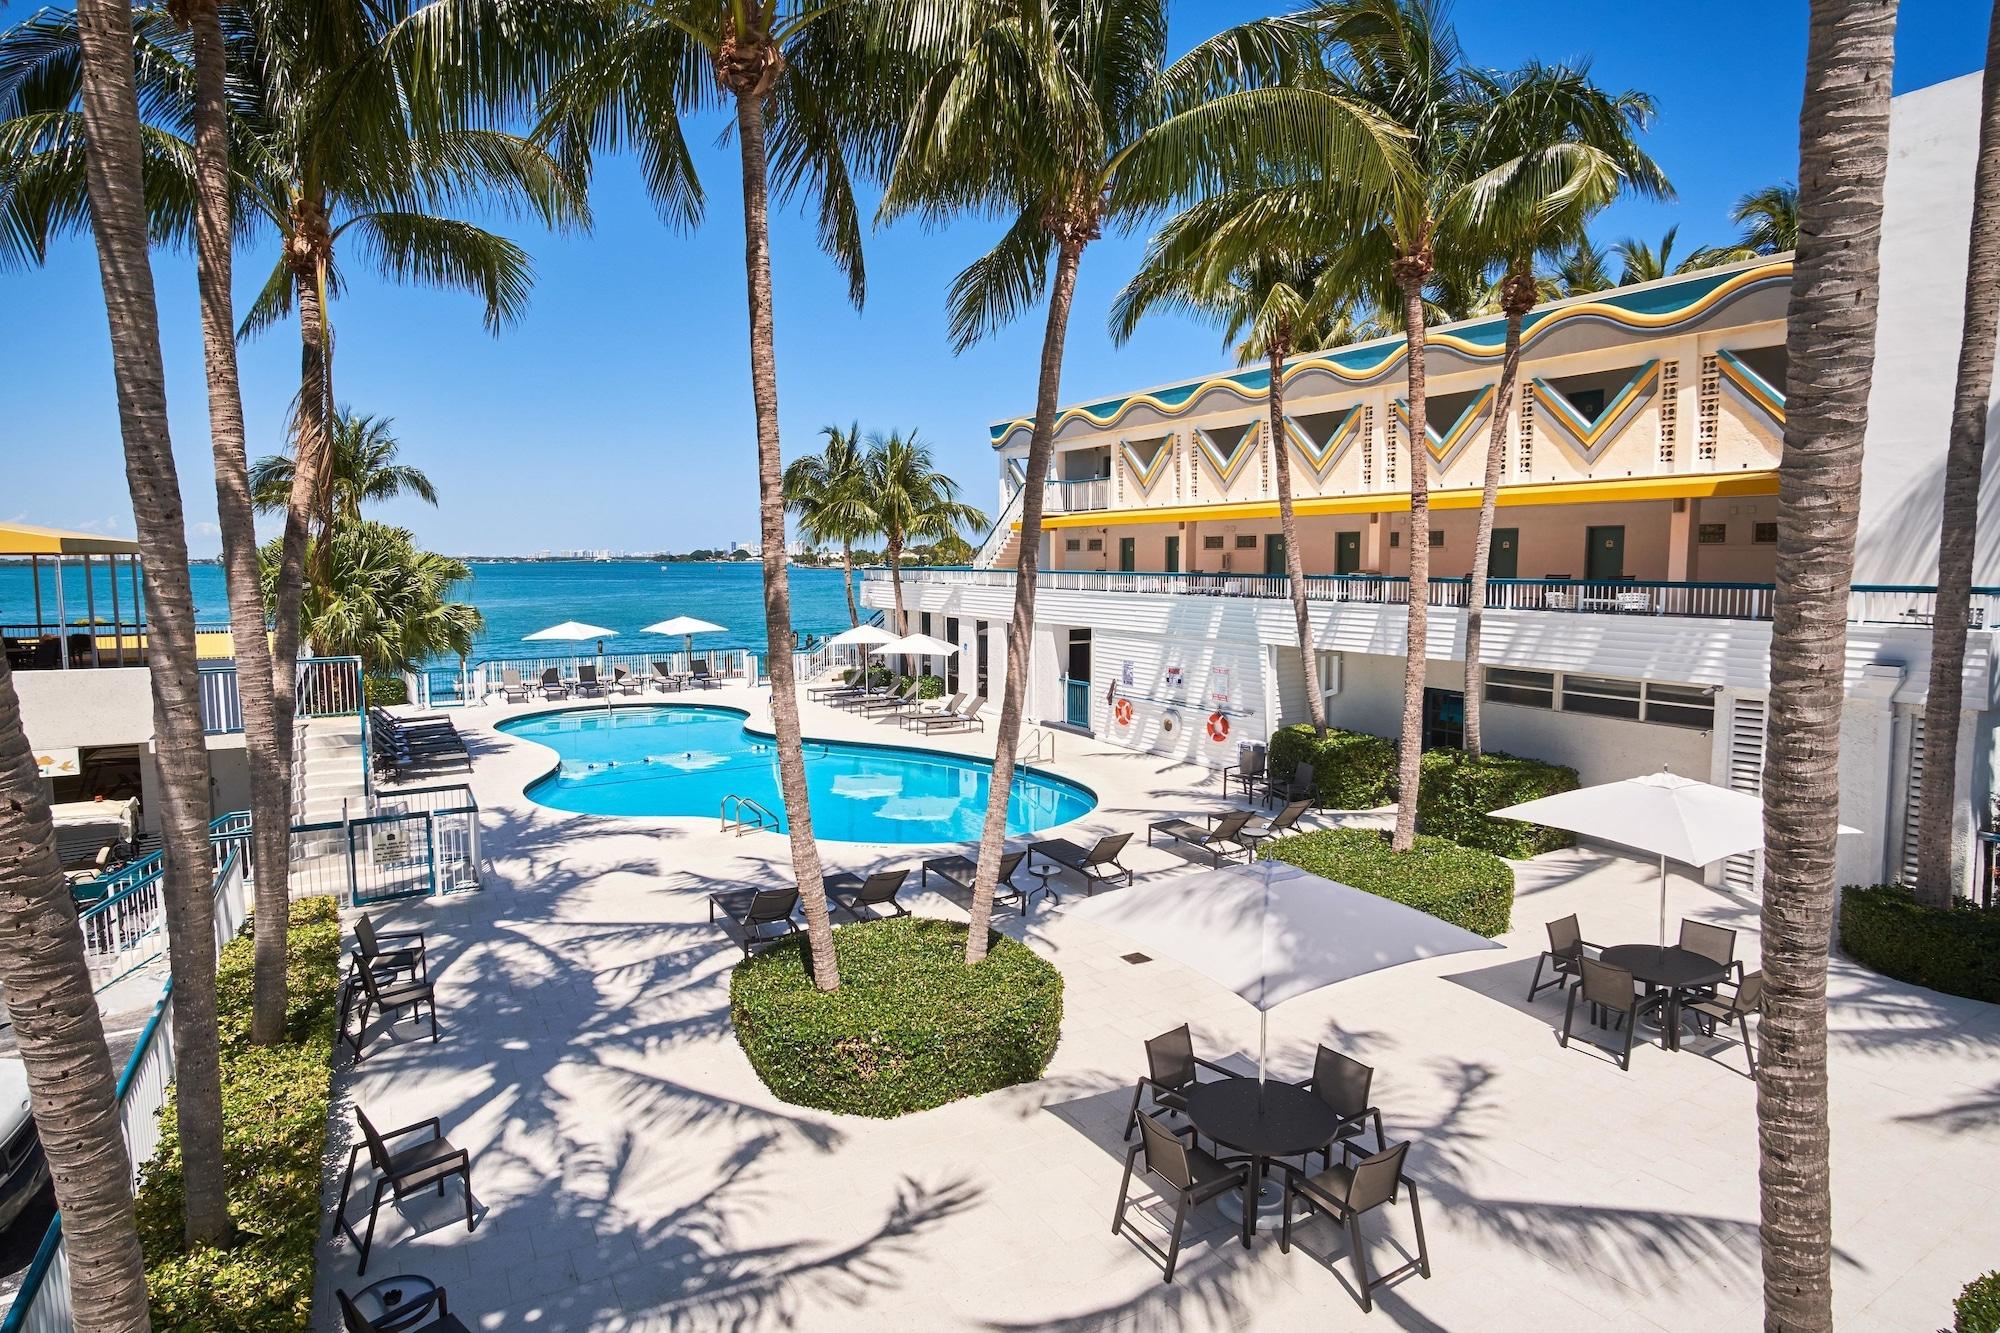 Best Western On the Bay Inn & Marina, Miami-Dade